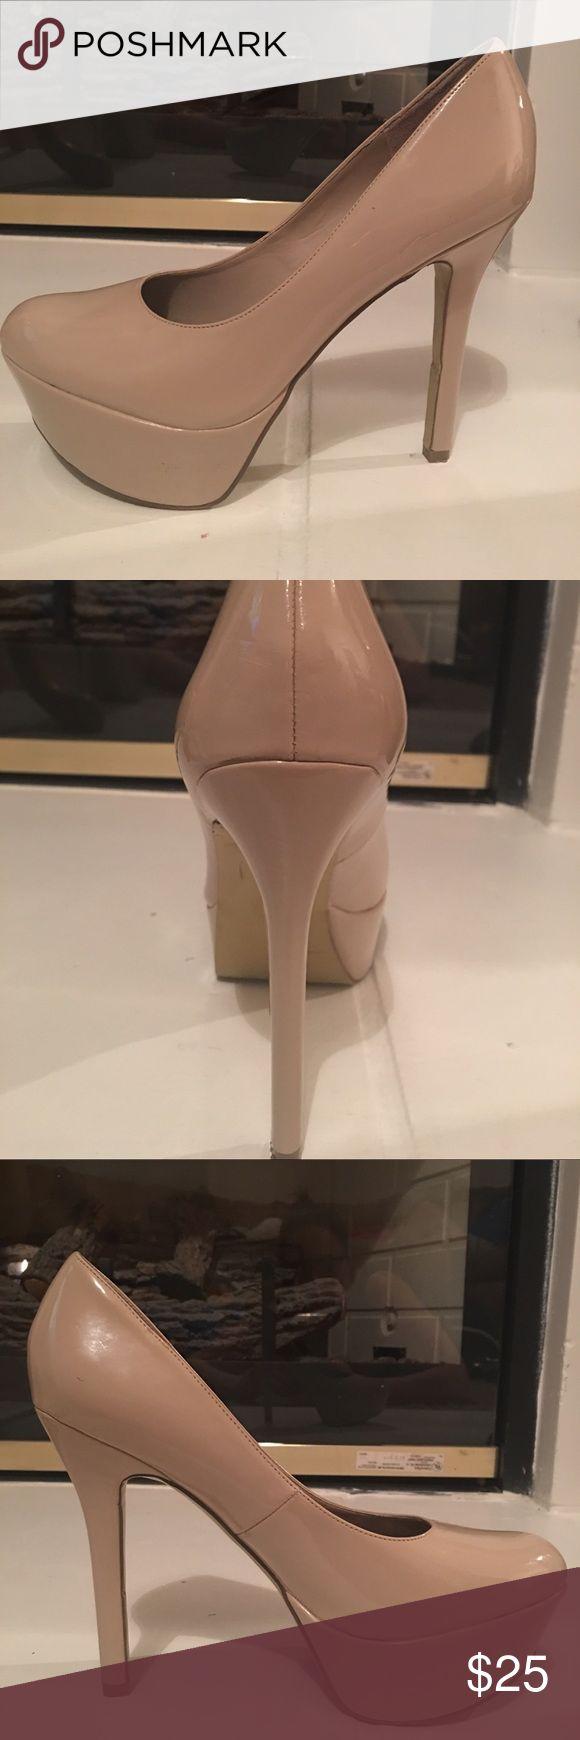 Carlos Santana tan heels. Carlos Santana tan heels. Size 8. Worn but taken great care of. Size 8. Heel 5 inch. Carlos Santana Shoes Heels